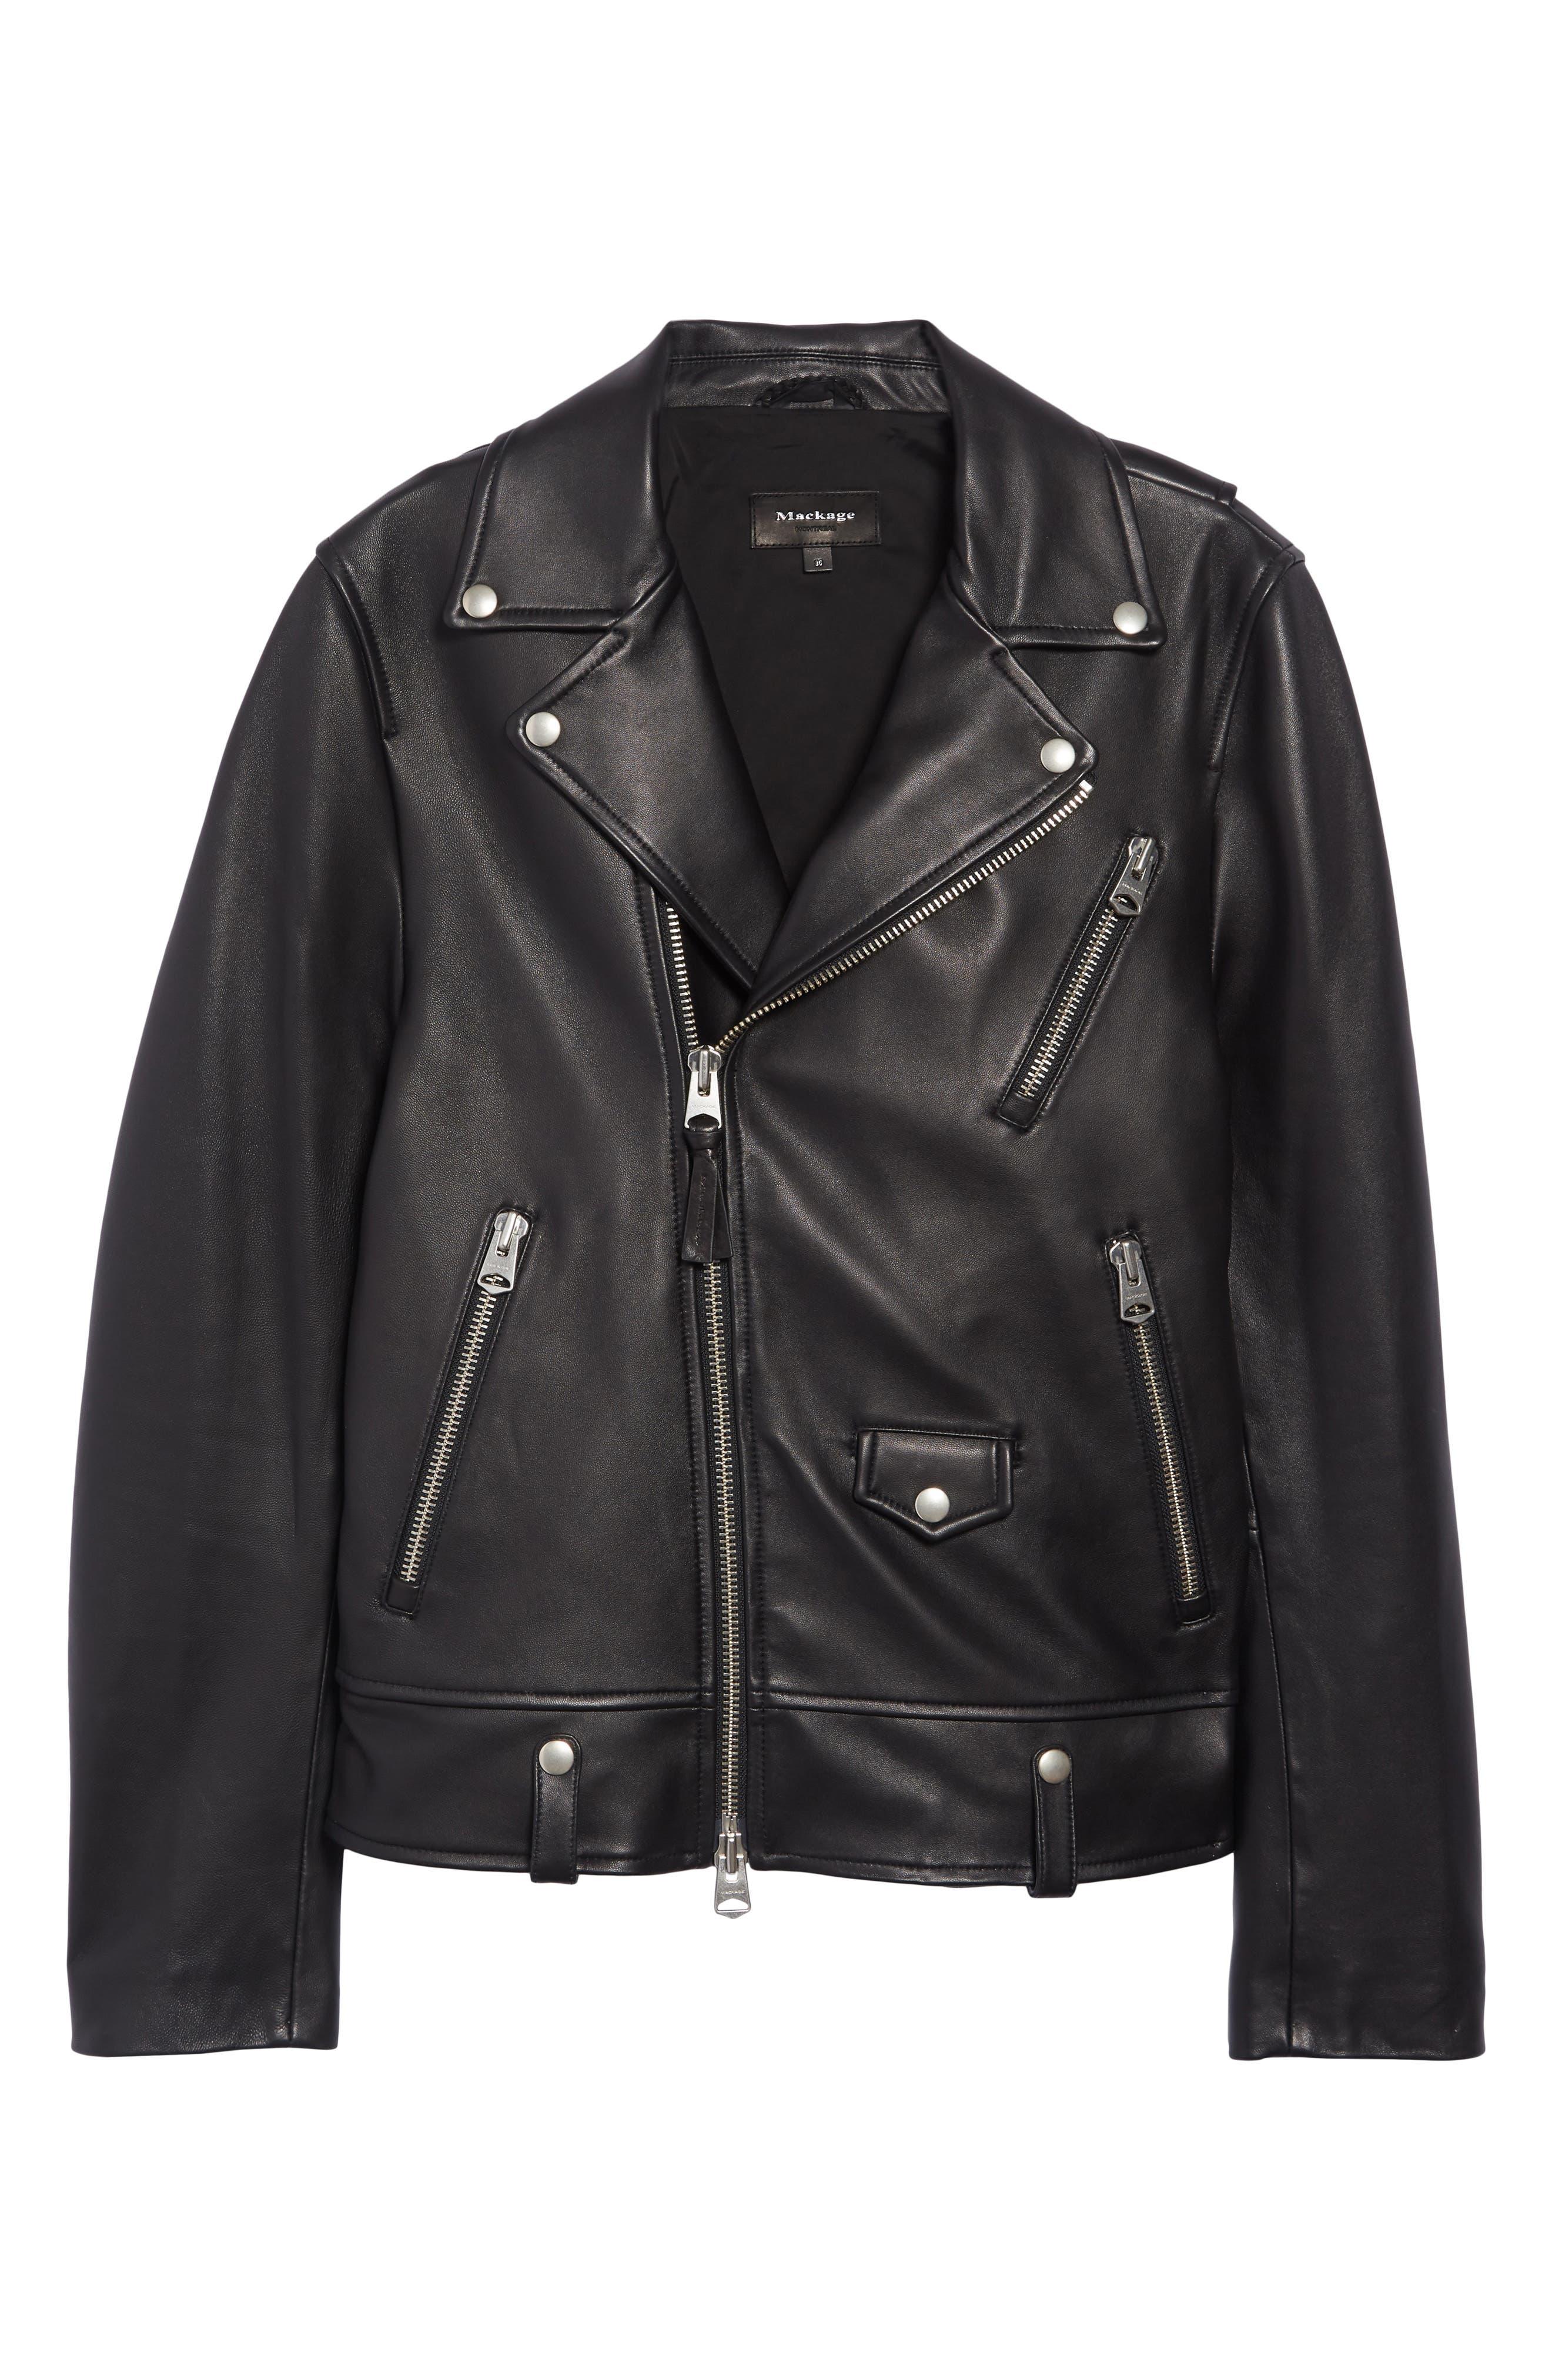 MACKAGE, Fenton Leather Moto Jacket, Alternate thumbnail 5, color, BLACK